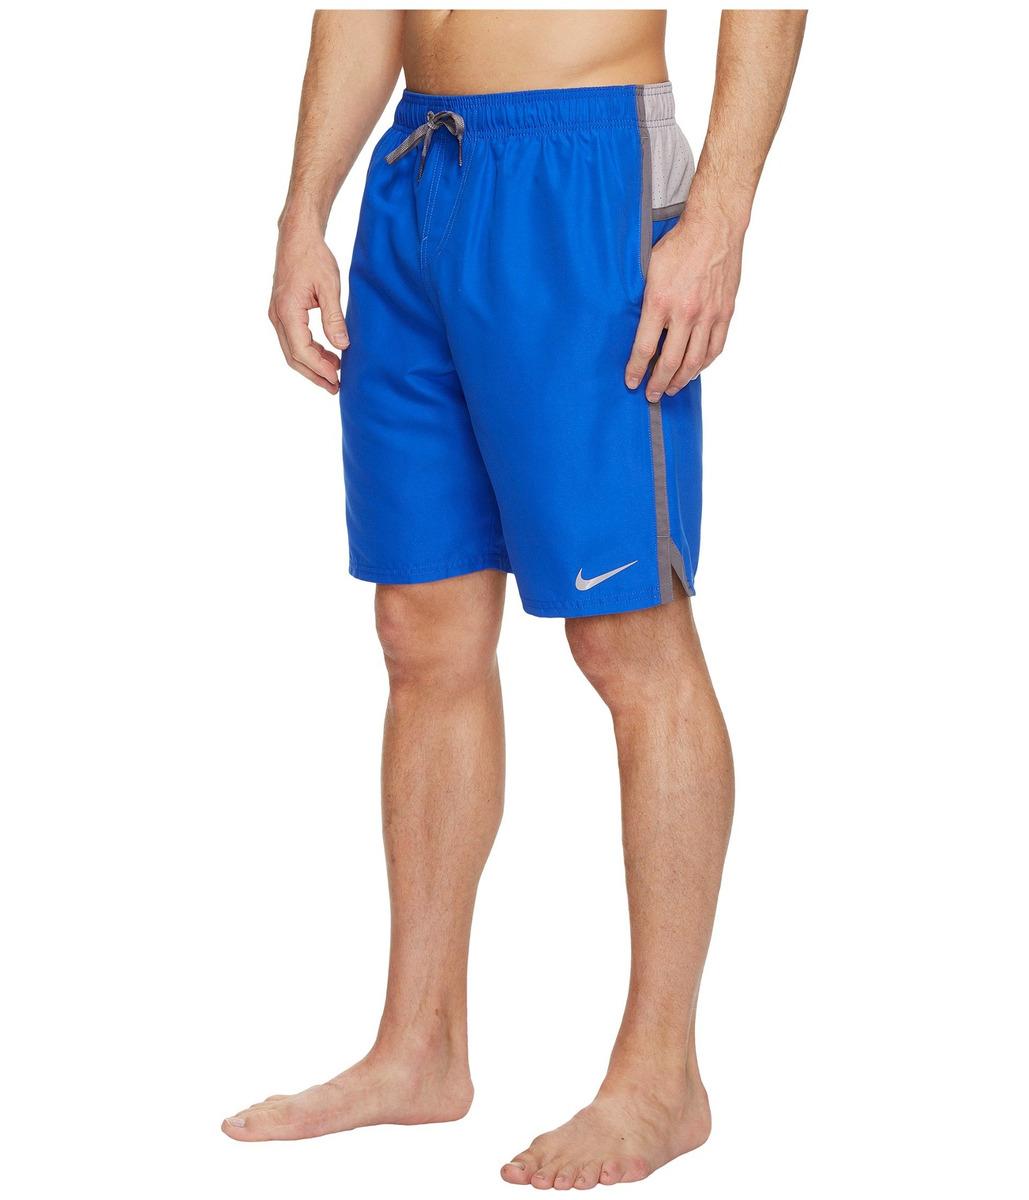 23b979ab7665 Ropa De Baño Hombre Nike Diverge 9 Volley Shorts